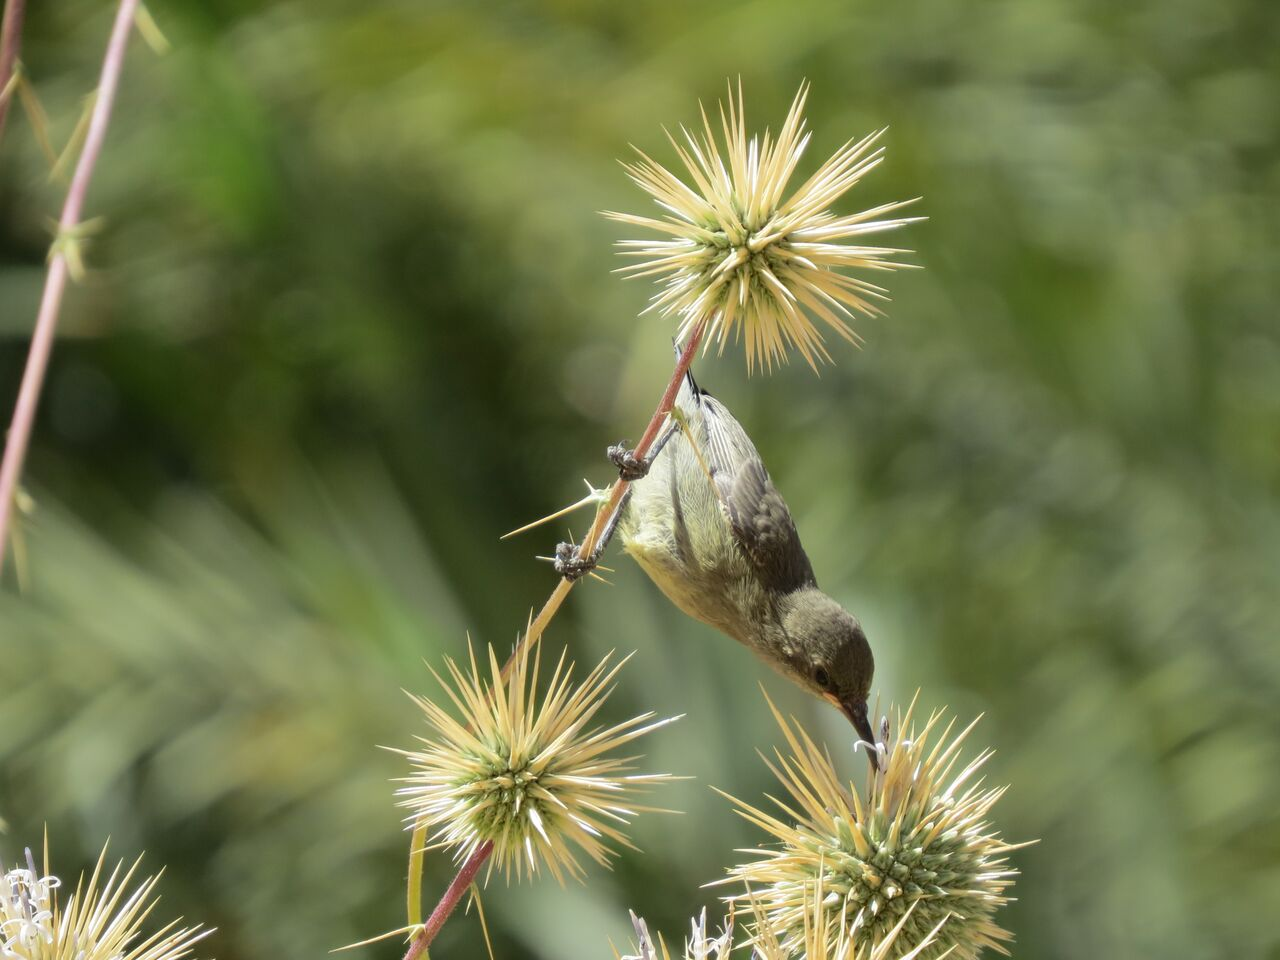 Palestinian sunbird feeding in Saudi